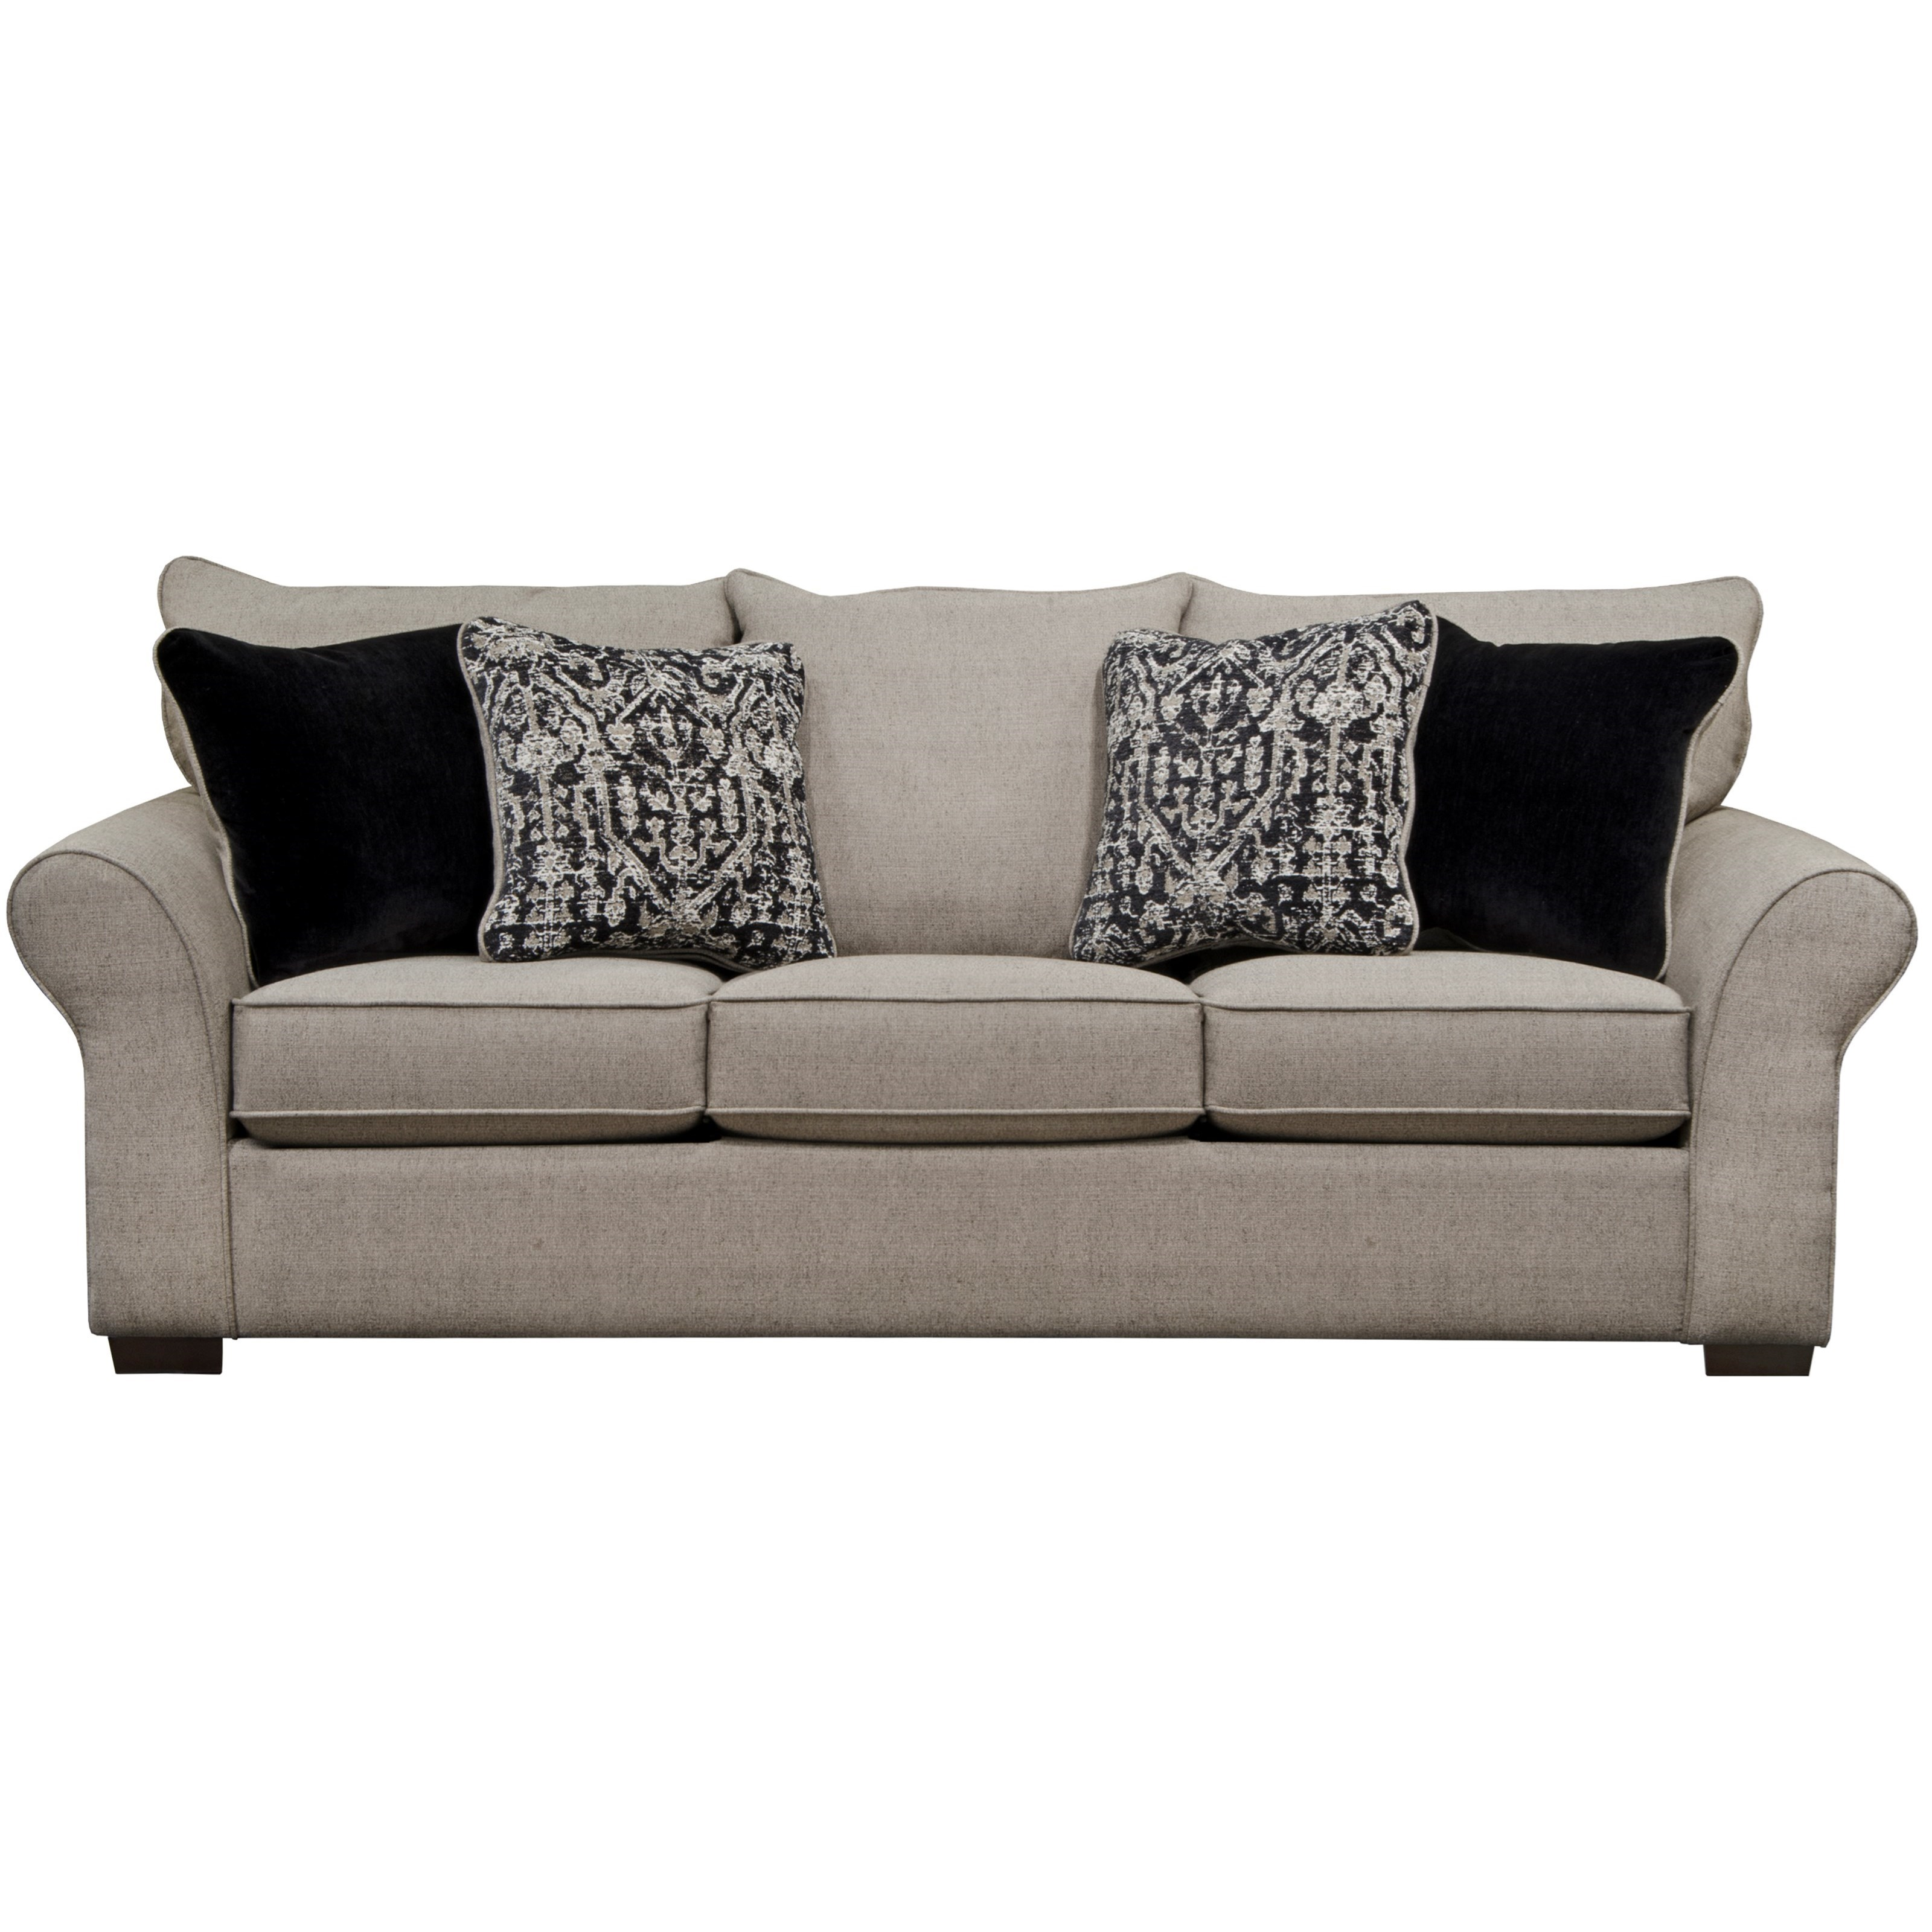 Furniture Furniture Stores In Lake Jackson Texas: Jackson Furniture Maddox 4152-03 Transitional Sofa With